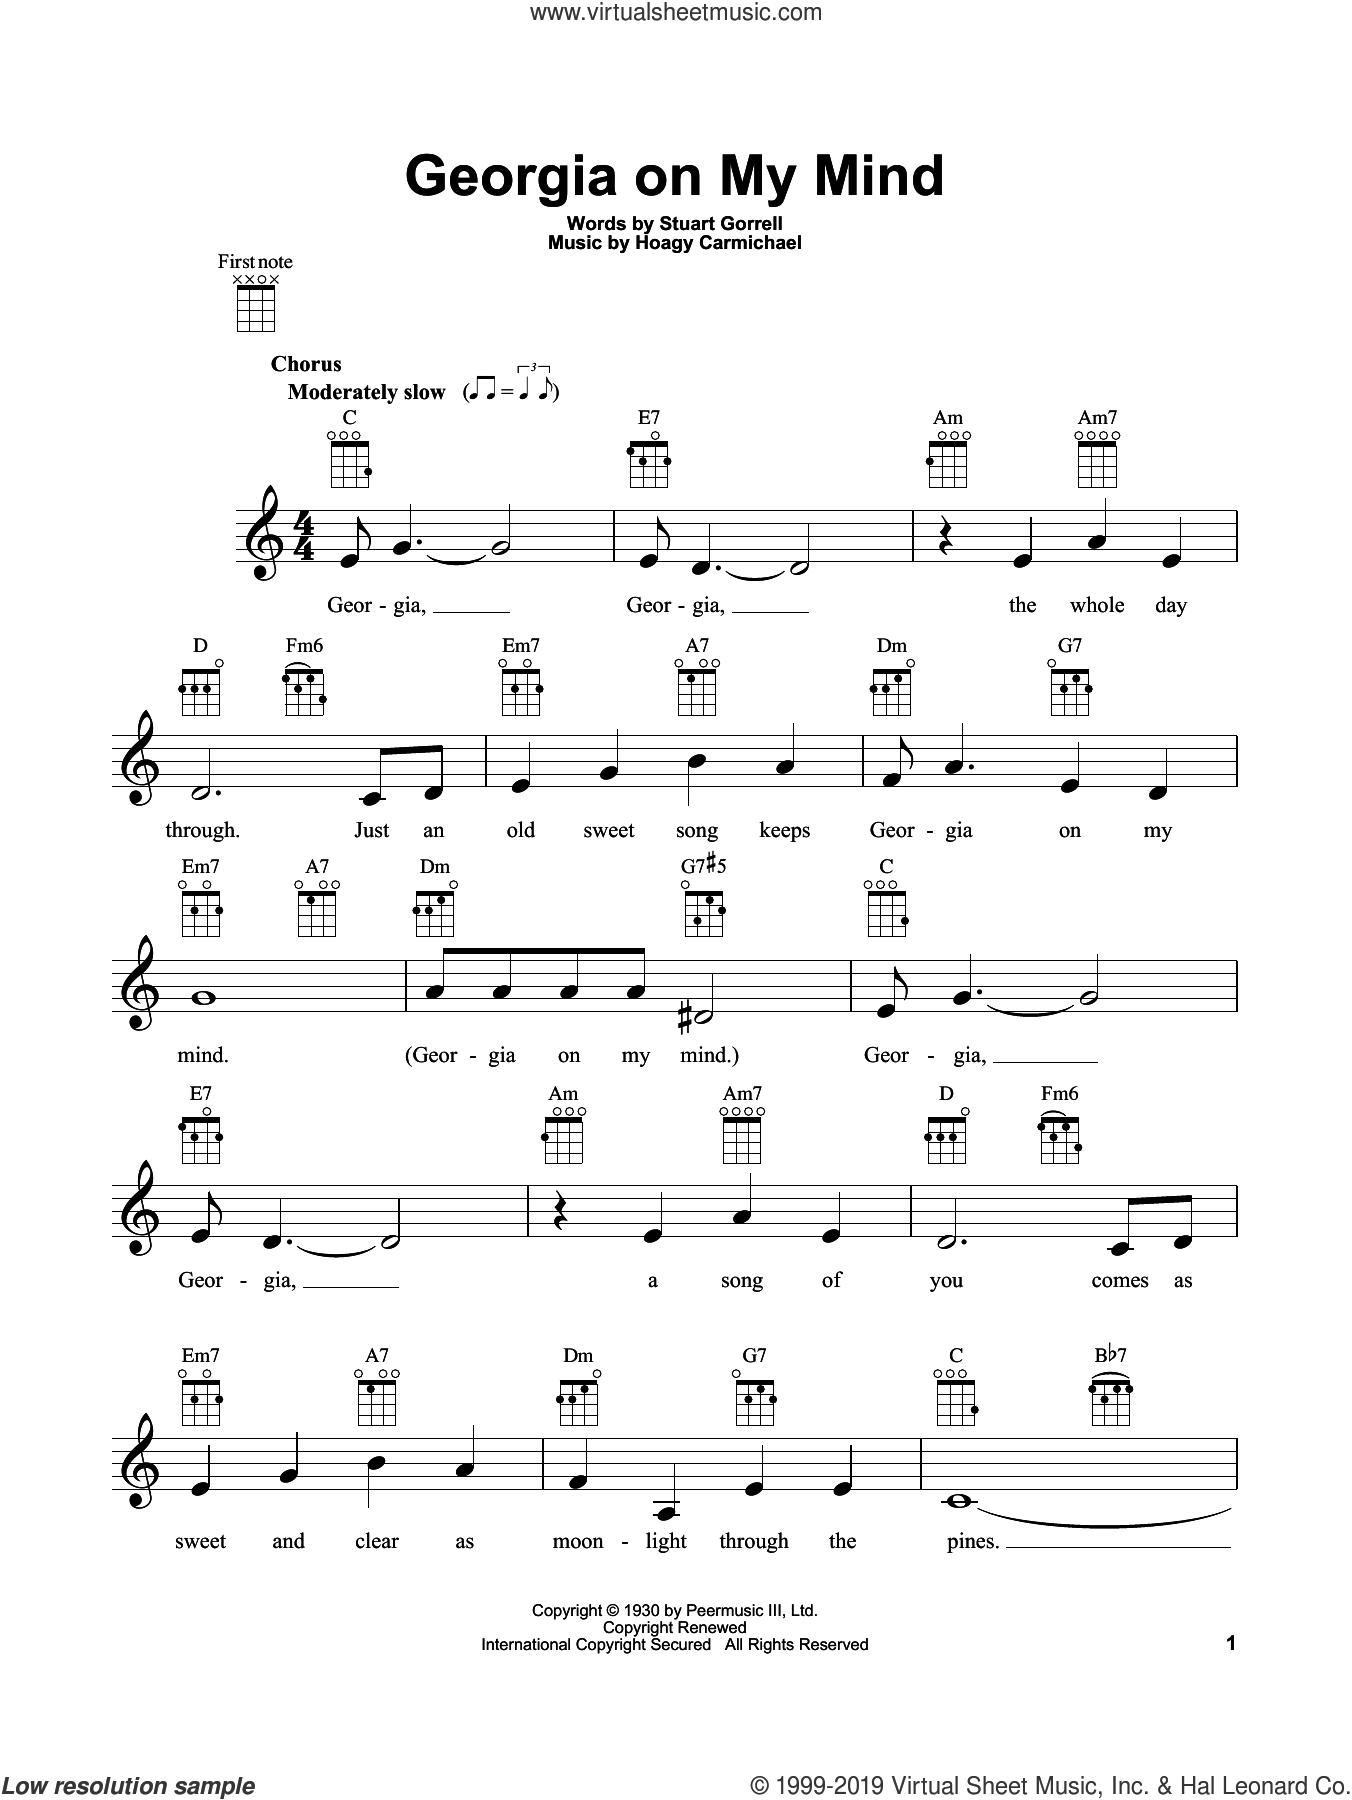 Georgia On My Mind sheet music for ukulele by Ray Charles, Hoagy Carmichael and Stuart Gorrell, intermediate skill level